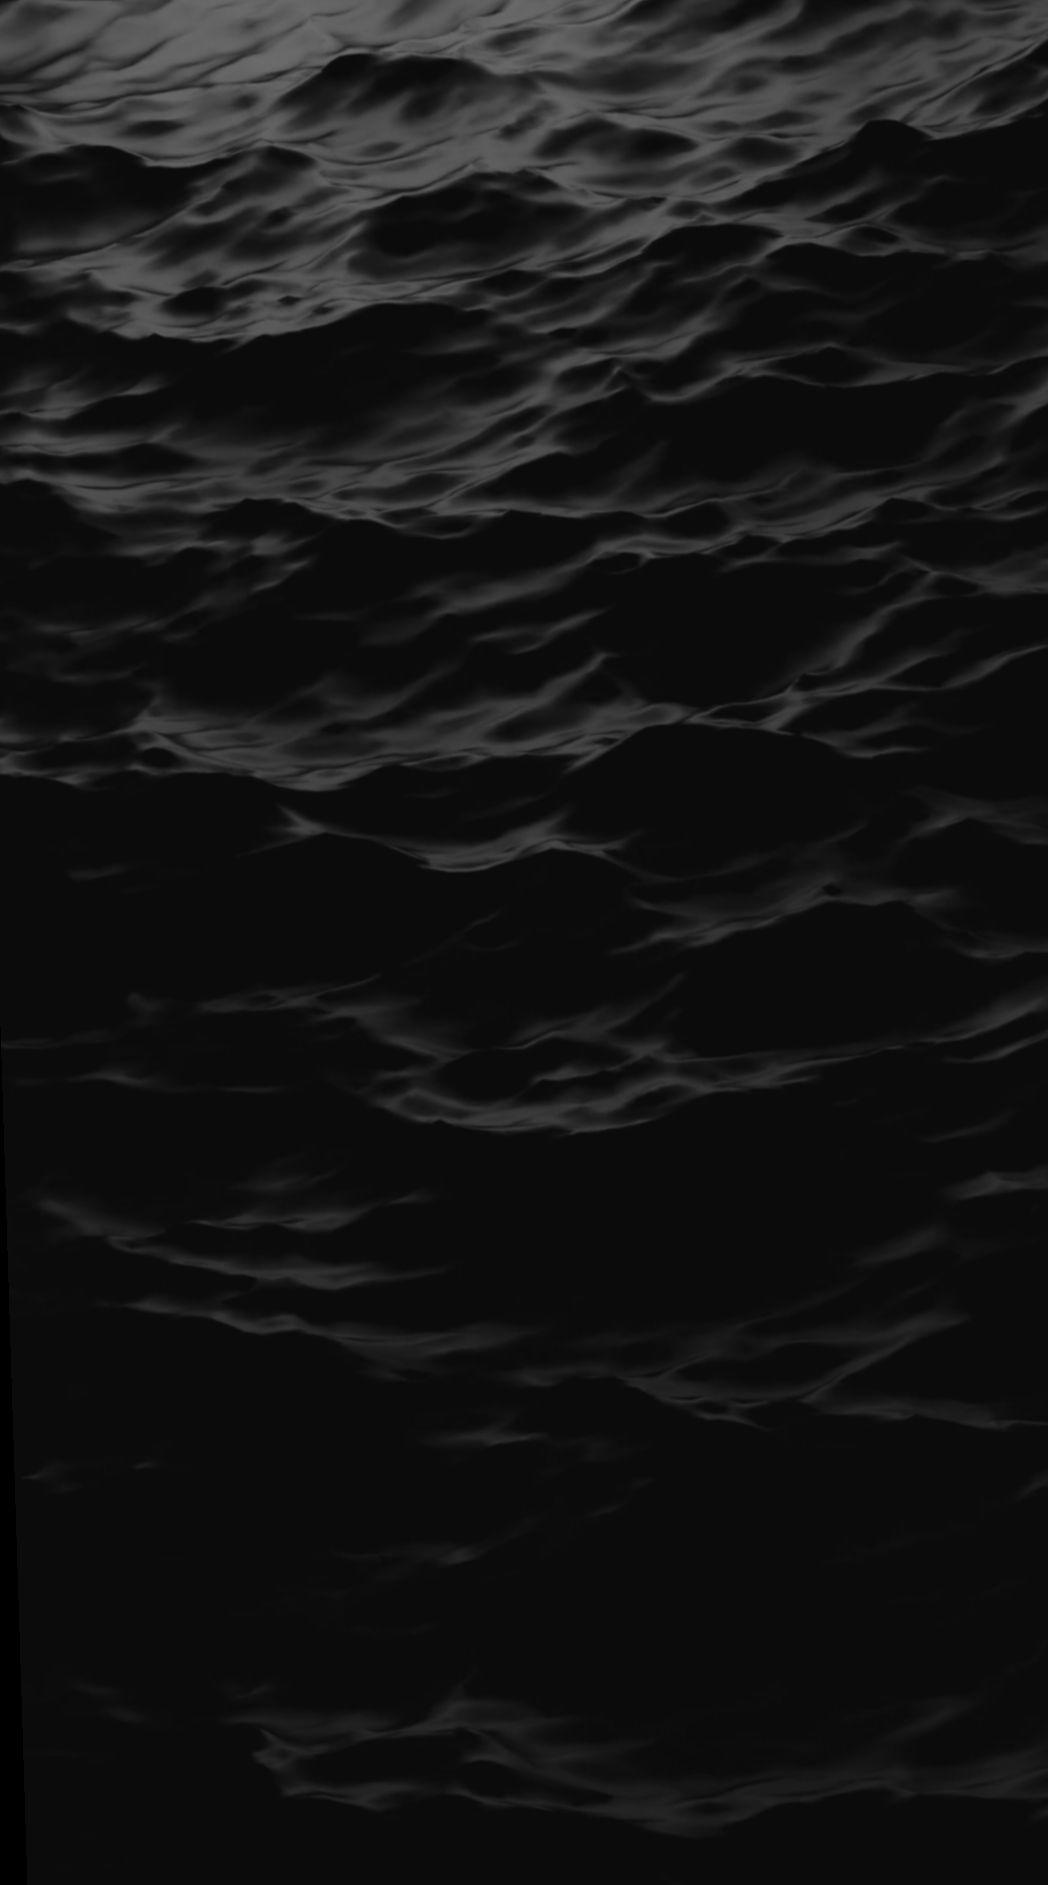 Wallpaper Ipad Dark Black Animal Dark Iphone Wallpaper Iphone Hitam Wallpaper Ipad Wallpaper Gelap